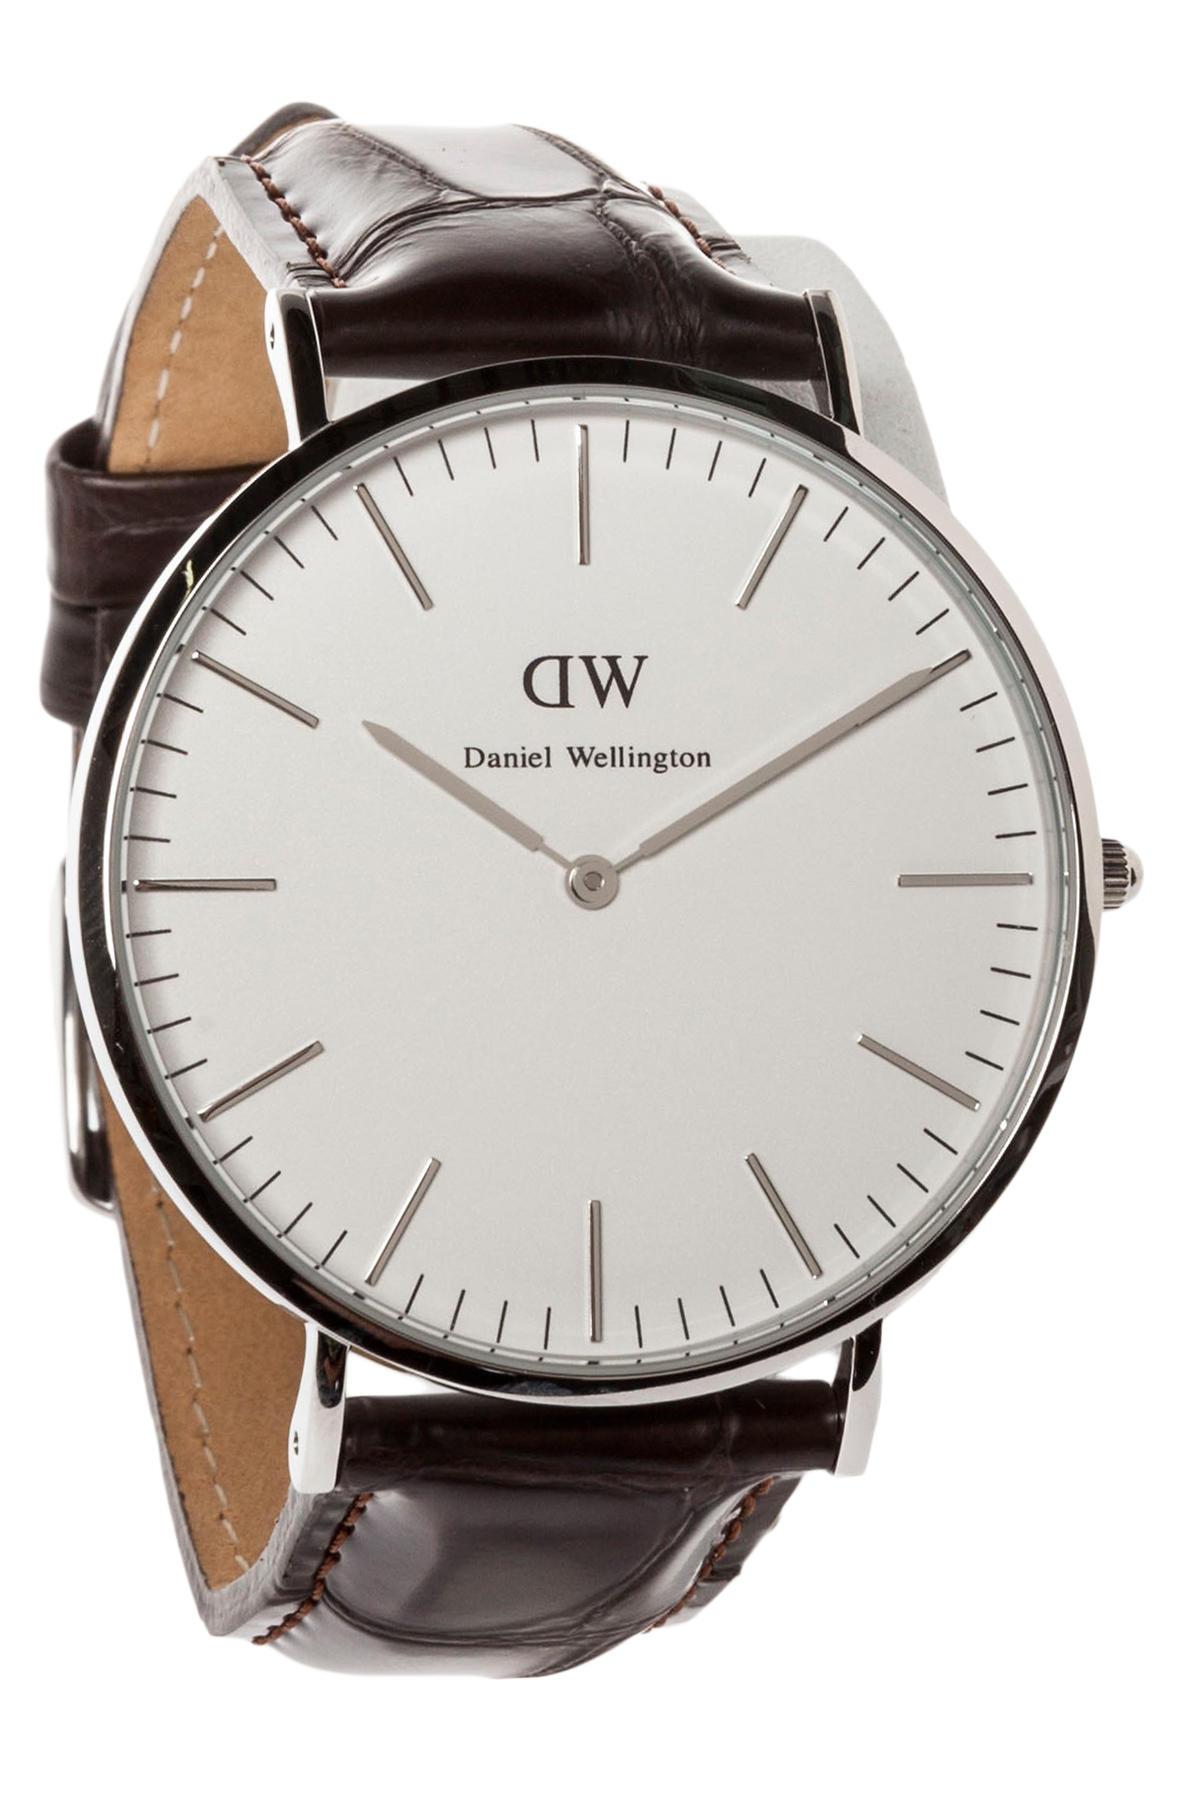 dcfe6ed14acb5 Lyst - Daniel Wellington The Classic York Watch in Metallic for Men